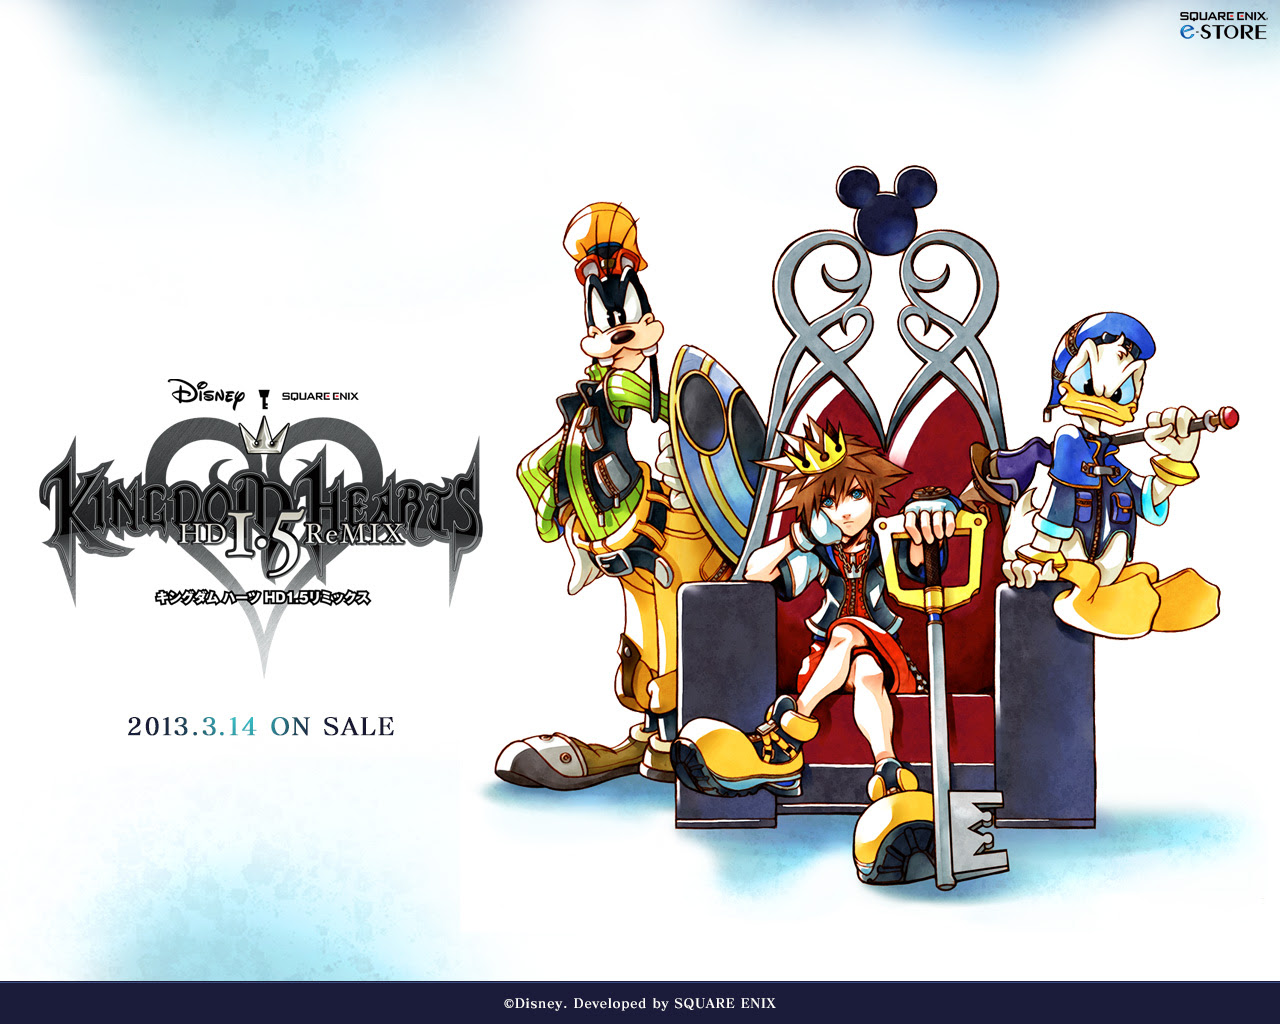 Kingdom Hearts Hd 1 5 Remix Wallpaper Kingdom Hearts Ultimania